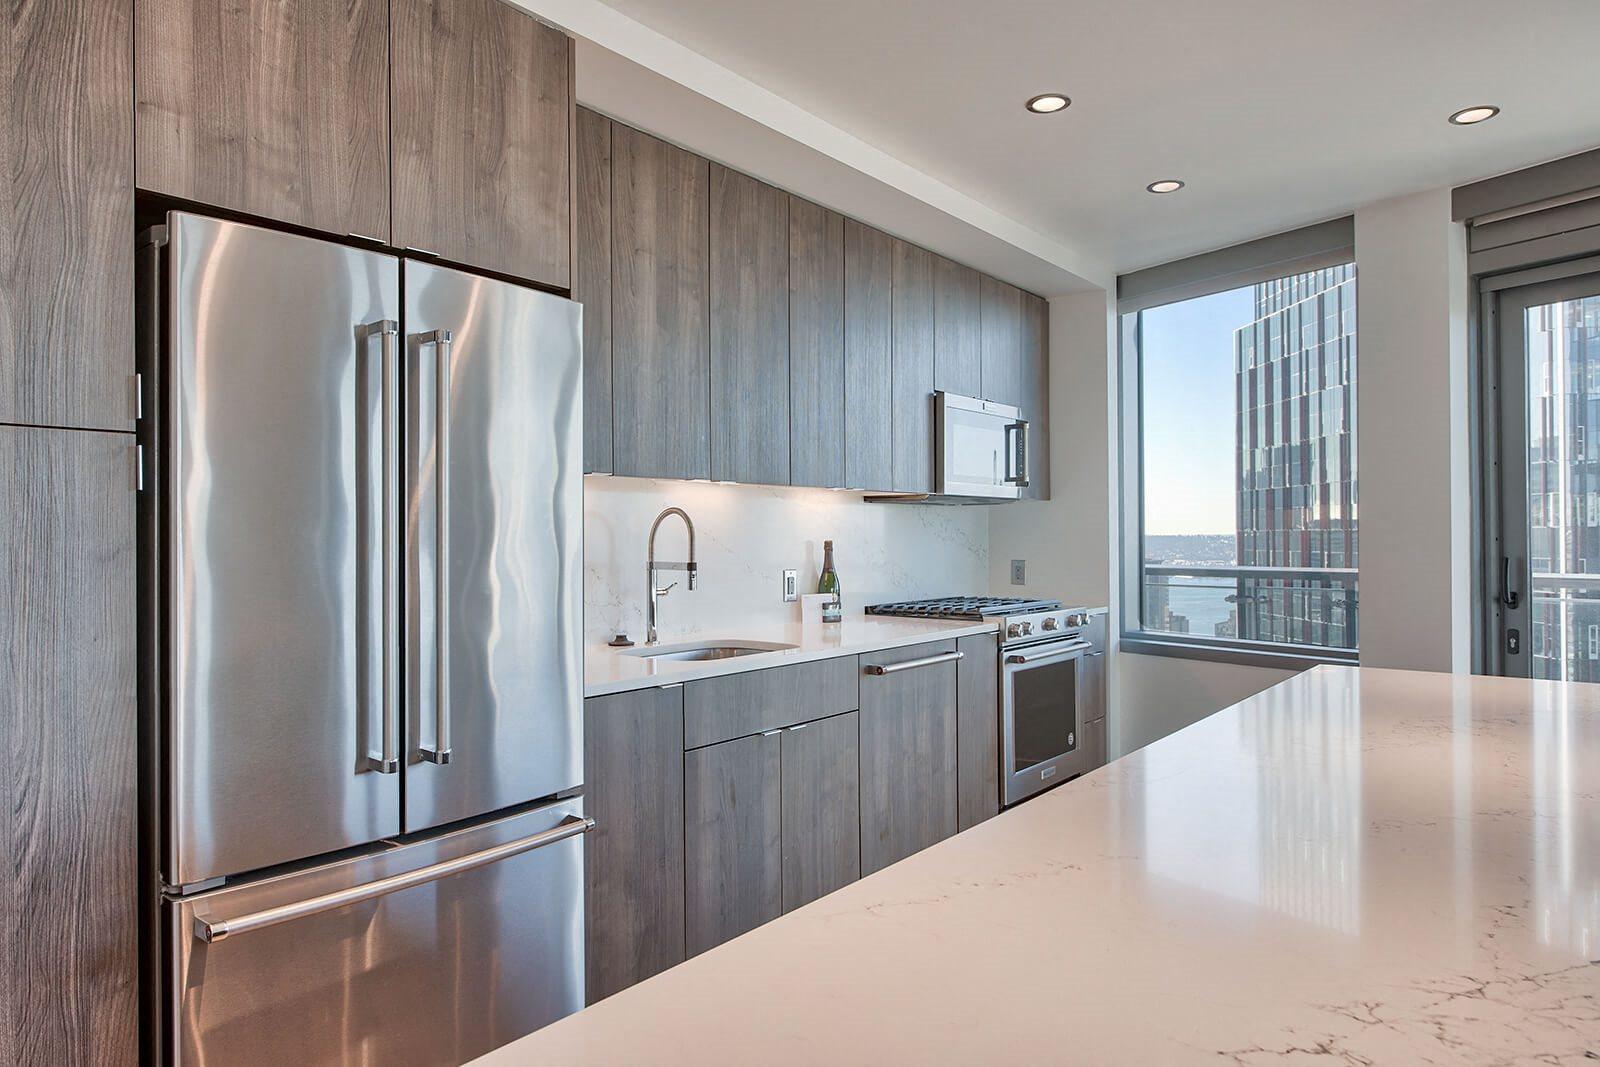 Stainless Steel Appliances in Kitchen at Stratus, Seattle, Washington